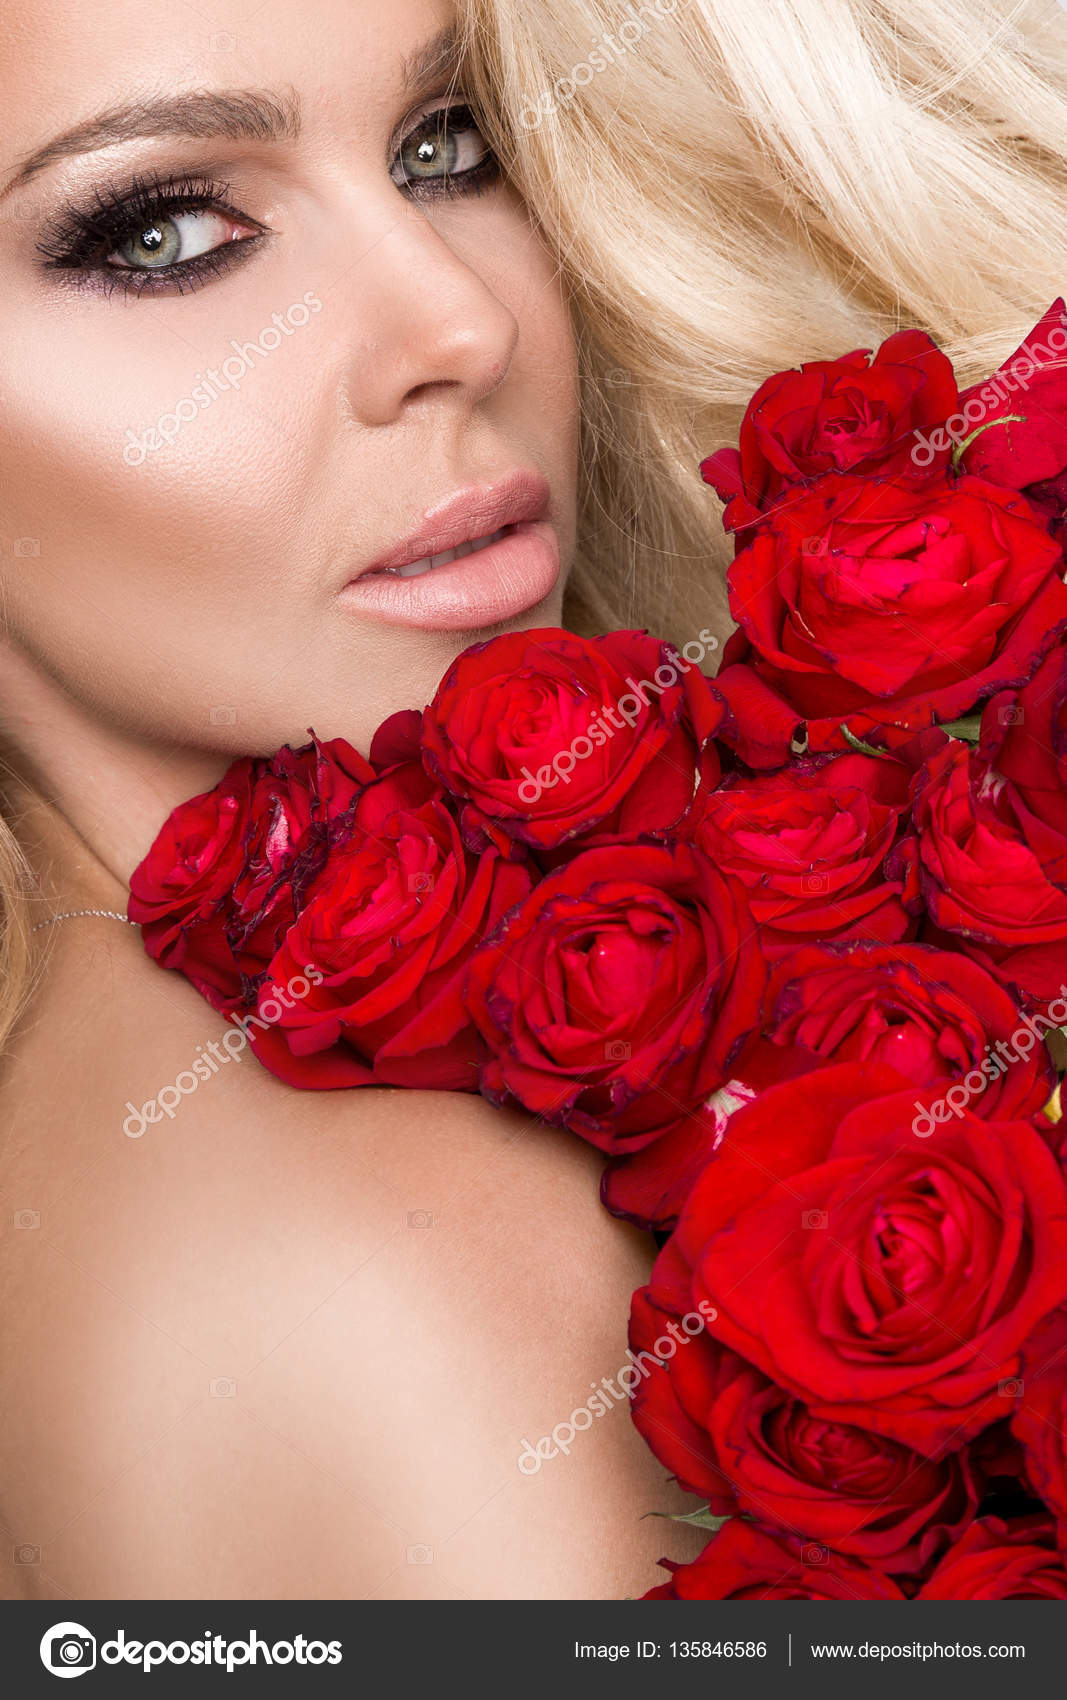 32b006295c5d Πορτρέτο του όμορφη ξανθιά γυναίκα και φαίνεται καταπληκτικό και μακριά  μαλλιά